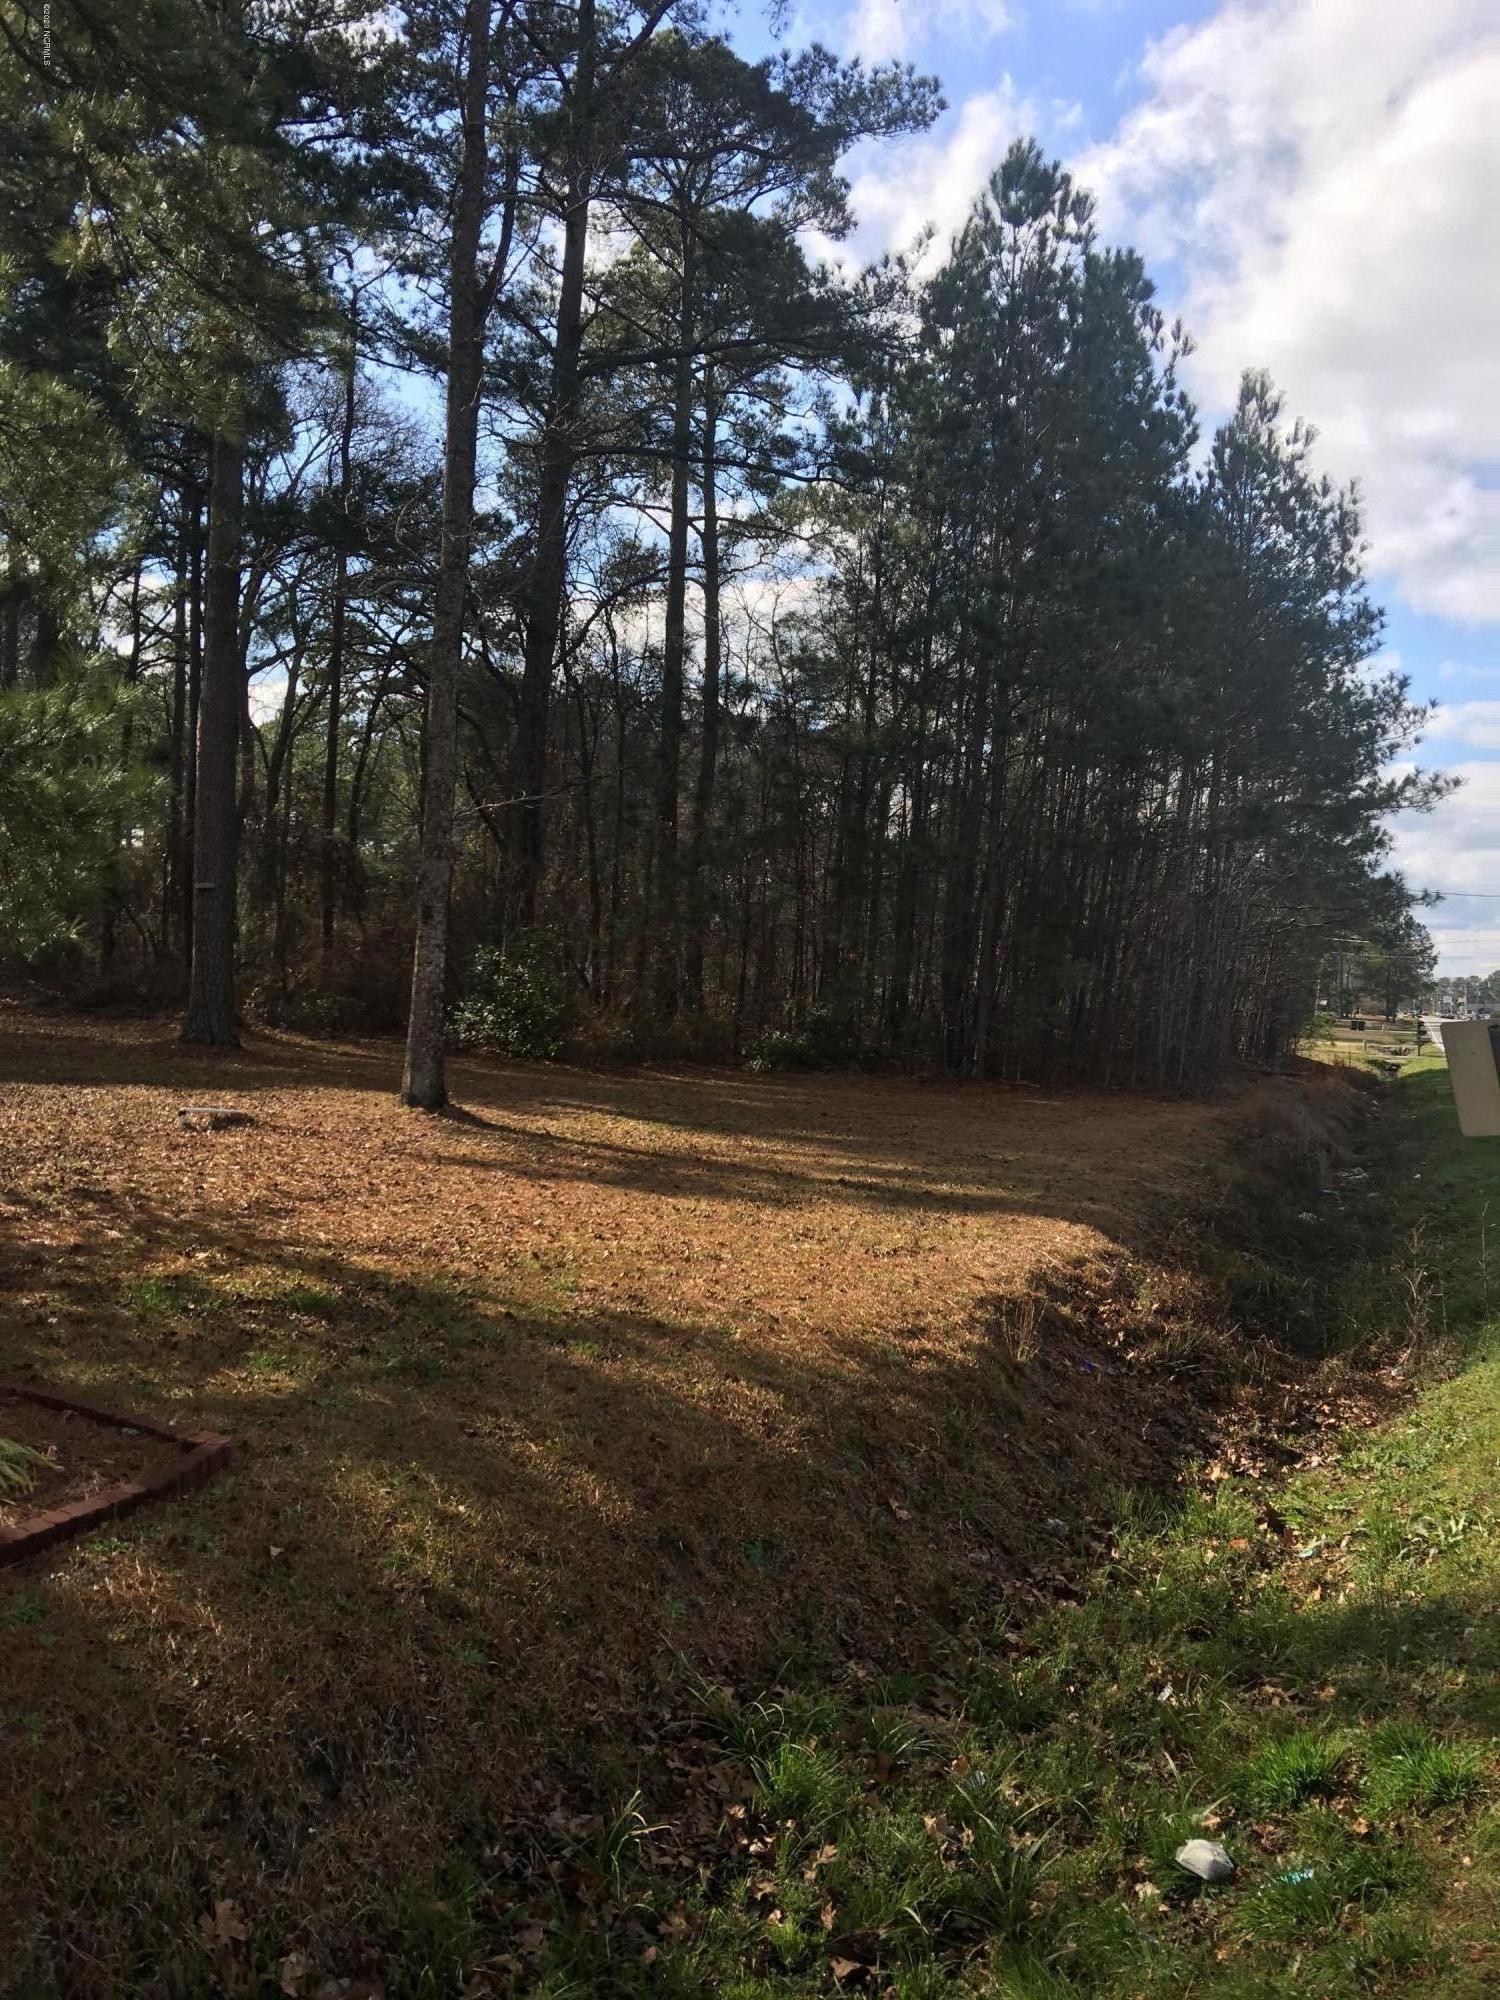 82, 84, 85, 8 New Hope Road, Goldsboro, North Carolina 27530, ,Residential land,For sale,New Hope,100211133